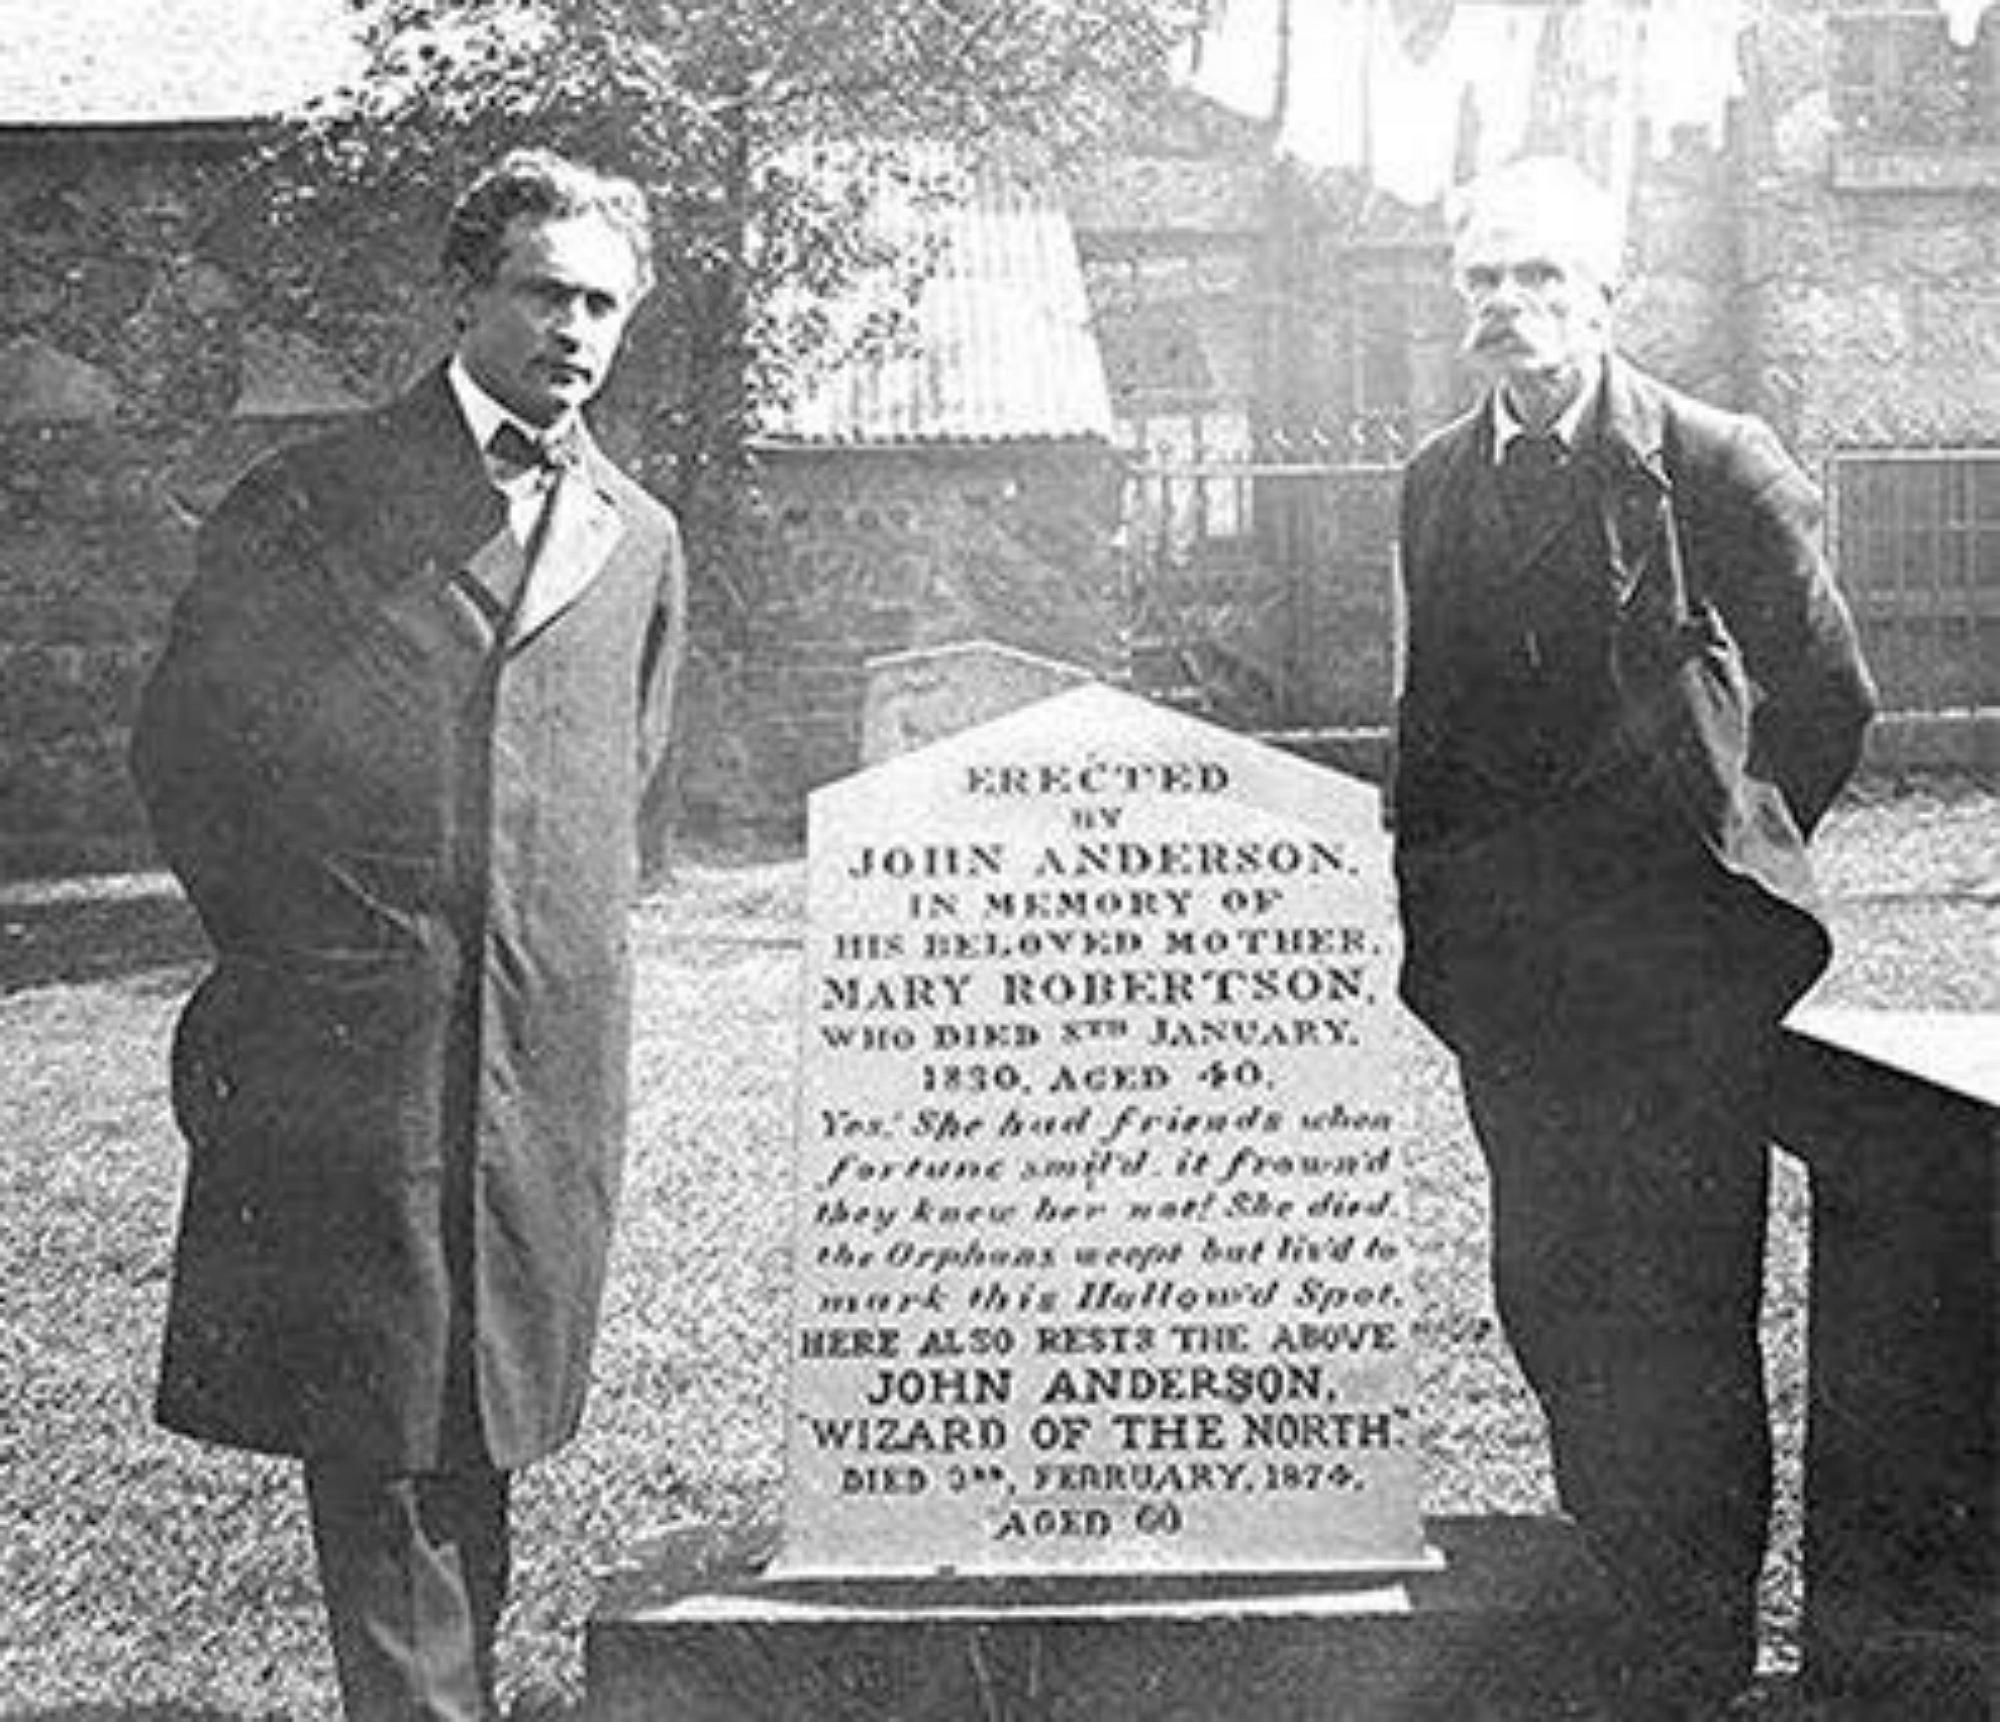 Houdini at John Andersons Graveside